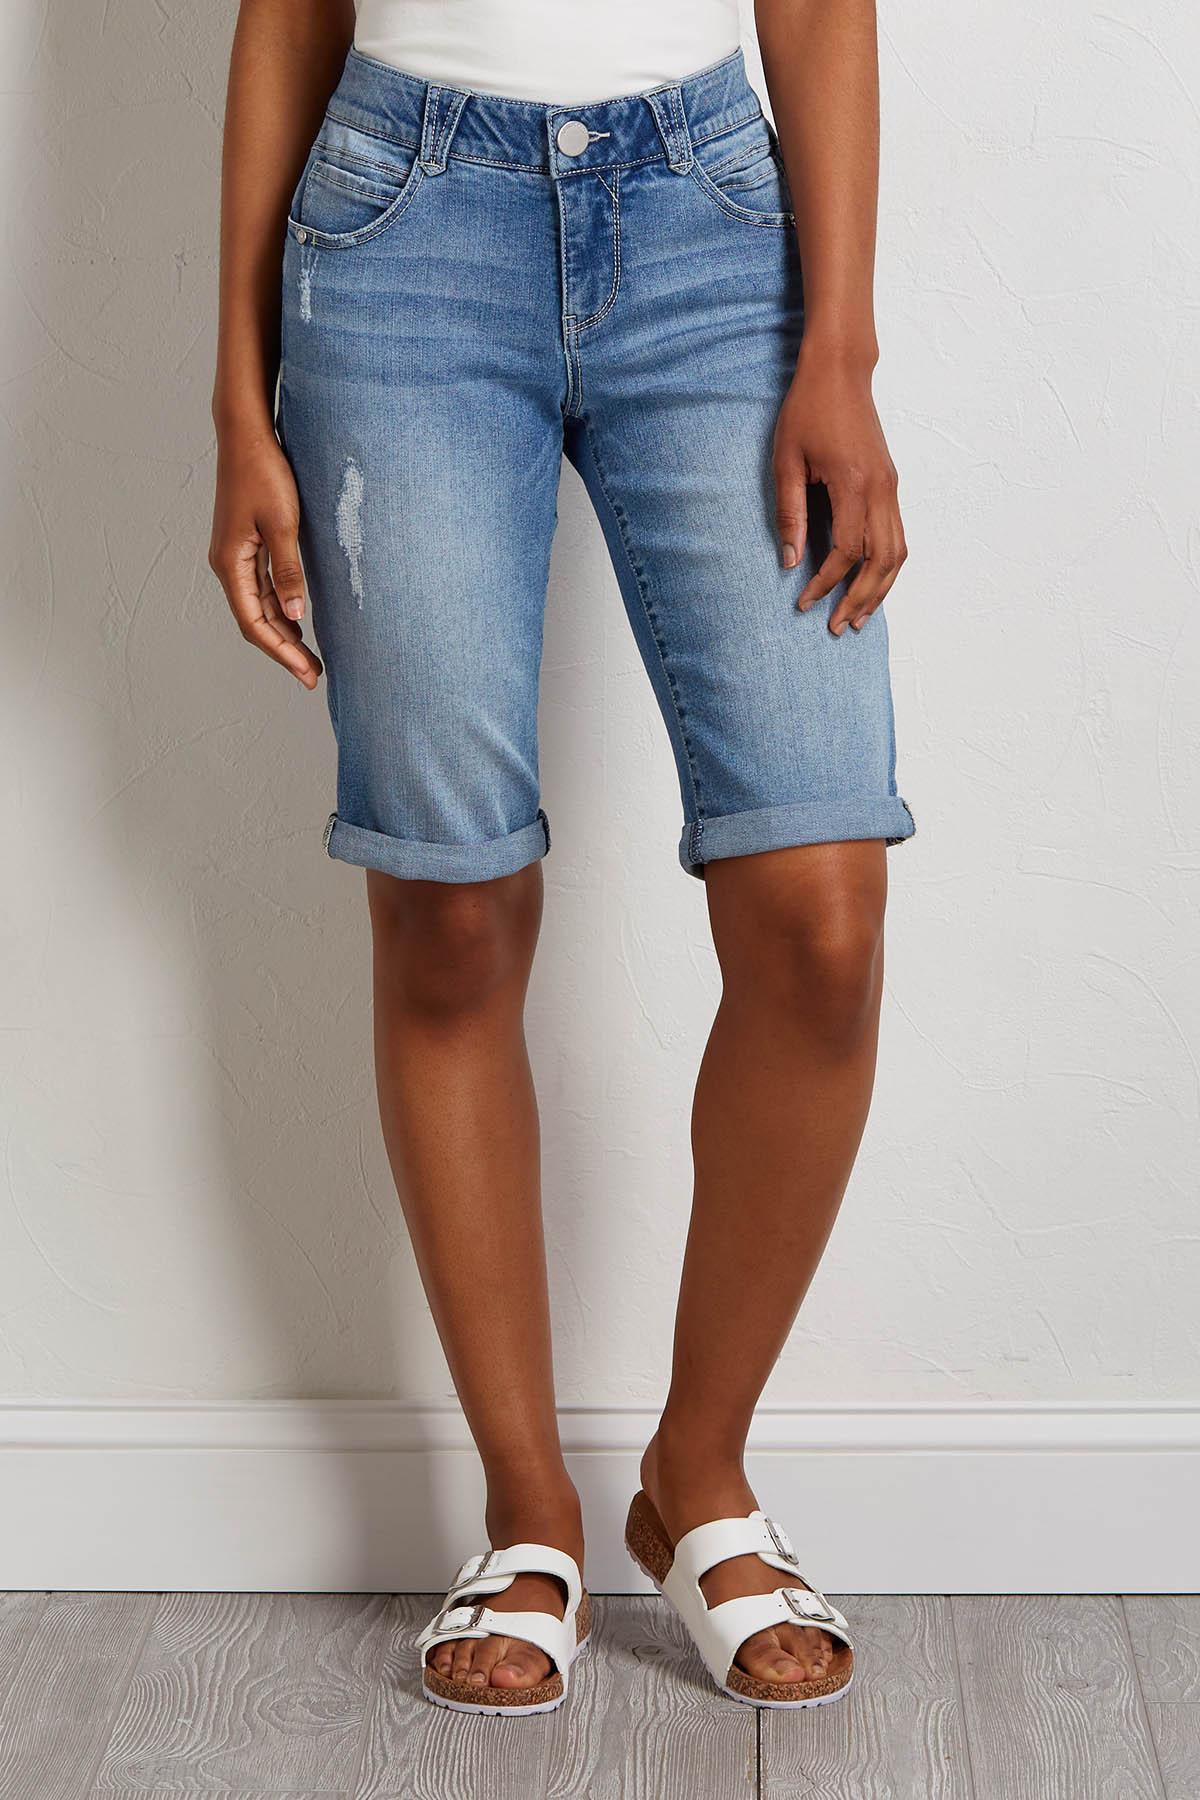 Slimming Denim Bermuda Shorts